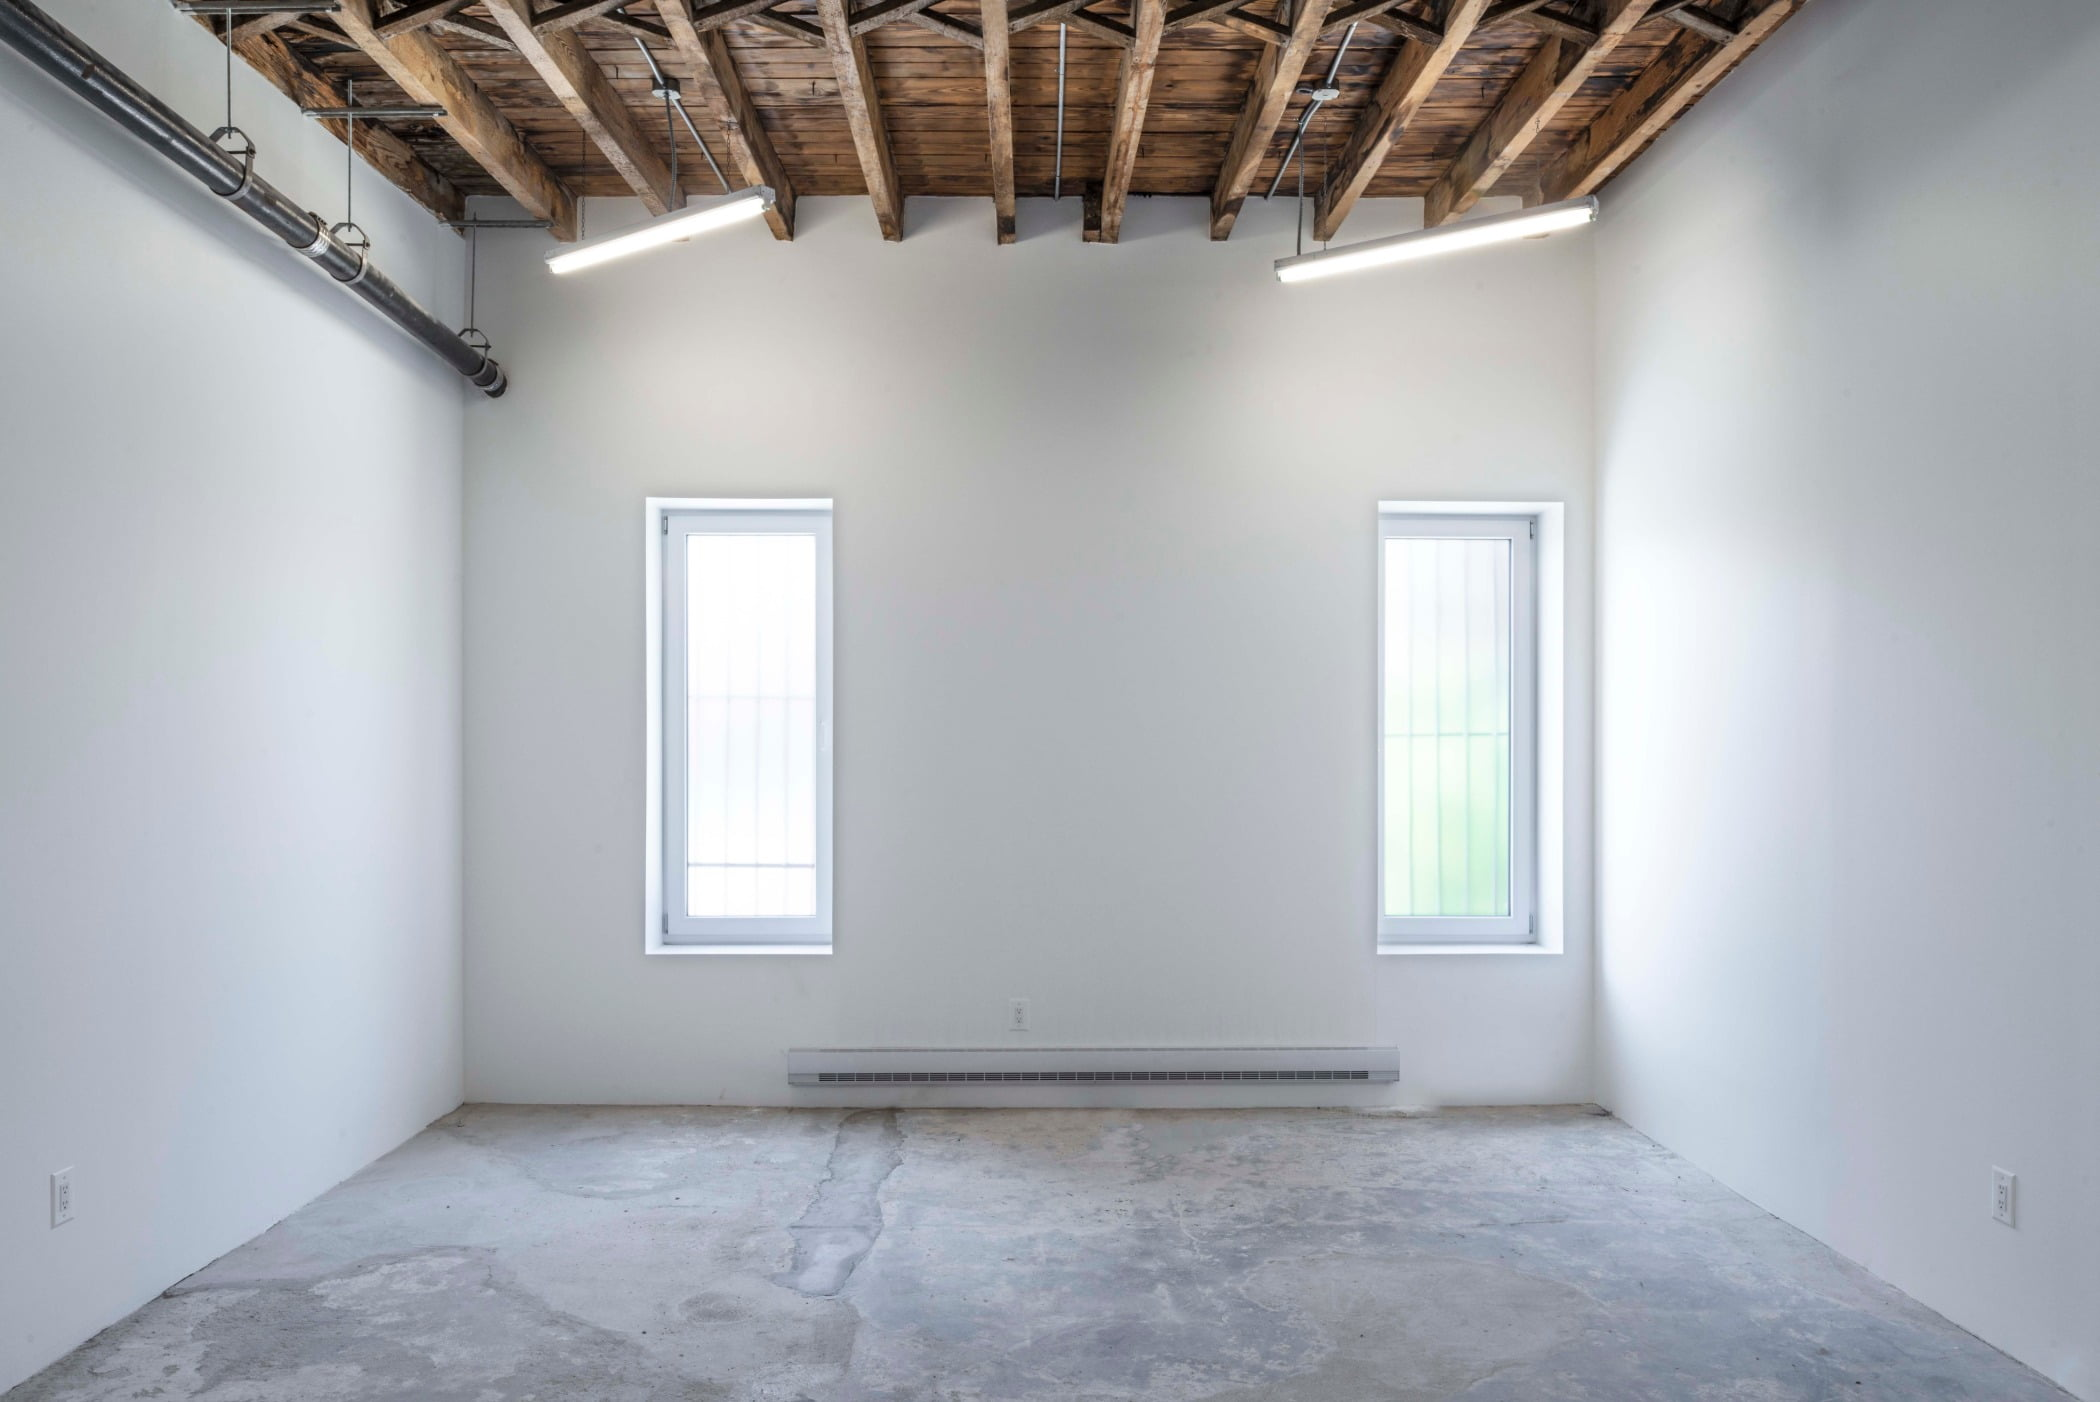 Interior design, Daytime, Building, Window, Fixture, Wood, Architecture, Hall, Floor, Flooring